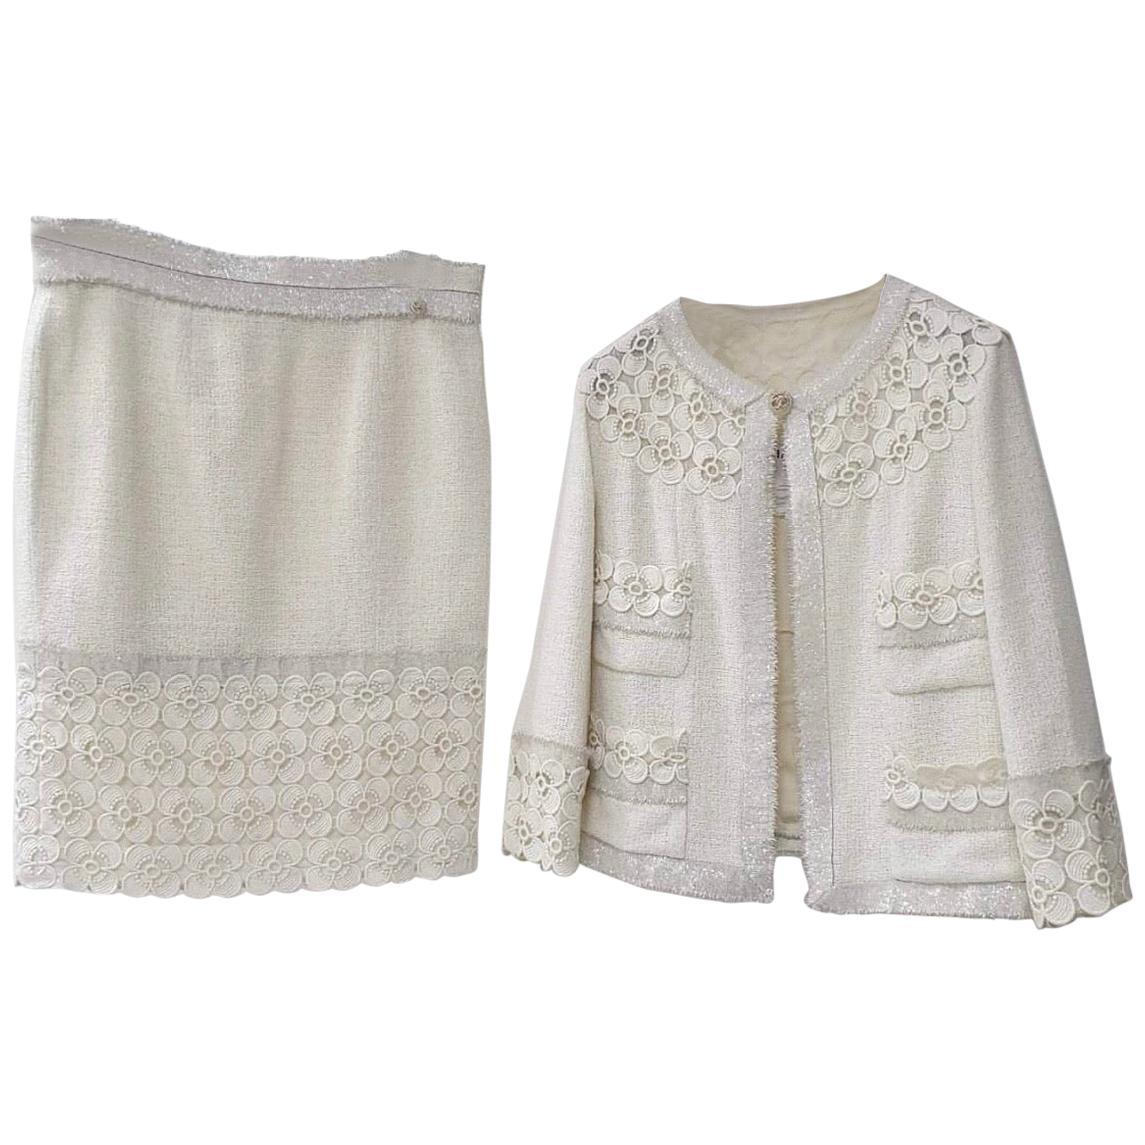 Chanel 11C ECRU TWEED LACE CAMELLIA GOLD CC logo Button Jacket Skirt Suit